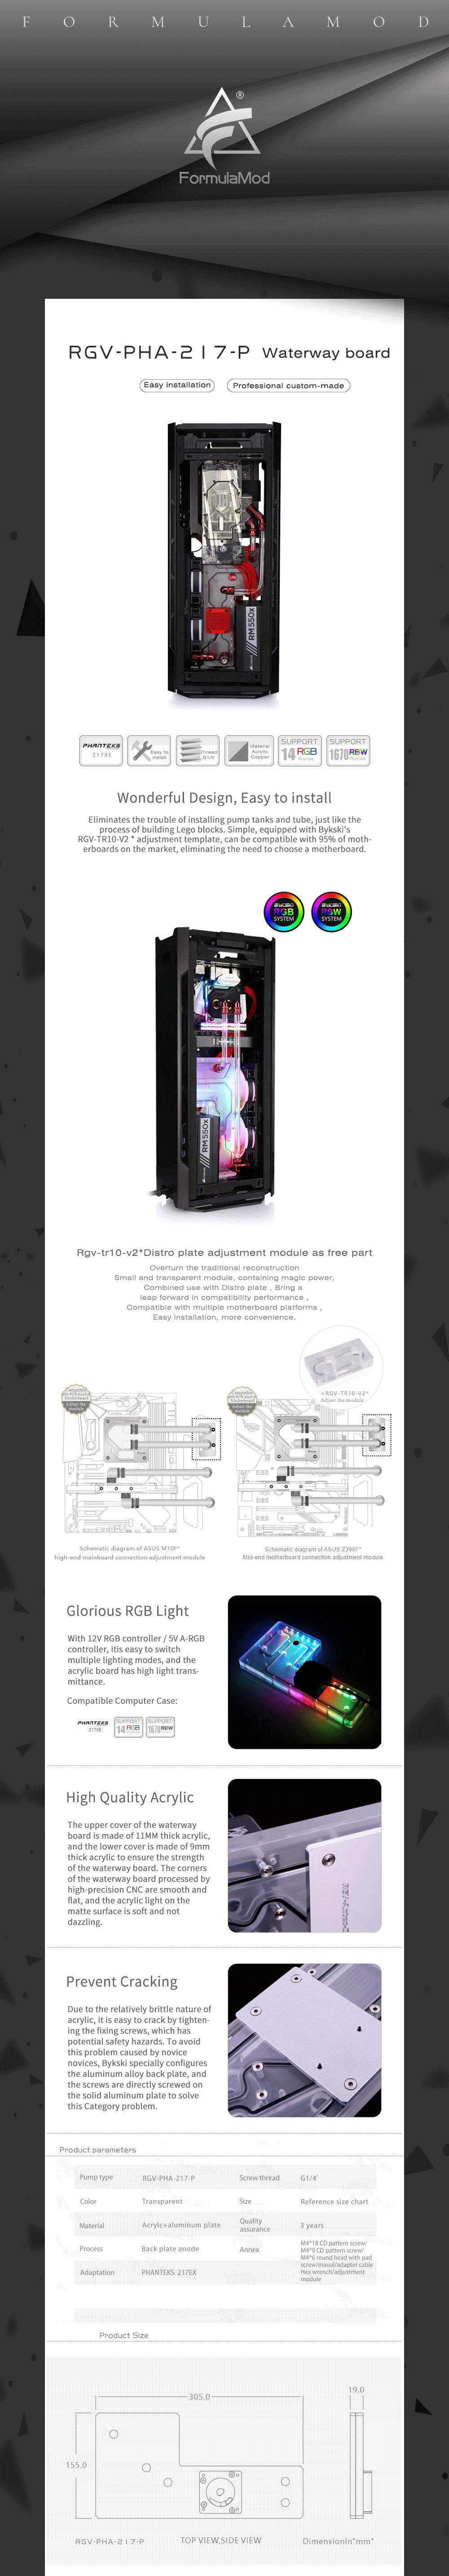 Bykski Waterway Cooling Kit For PHANTEKS 217EX Case, 5V ARGB, For Single GPU Building, RGV-PHA-217-P